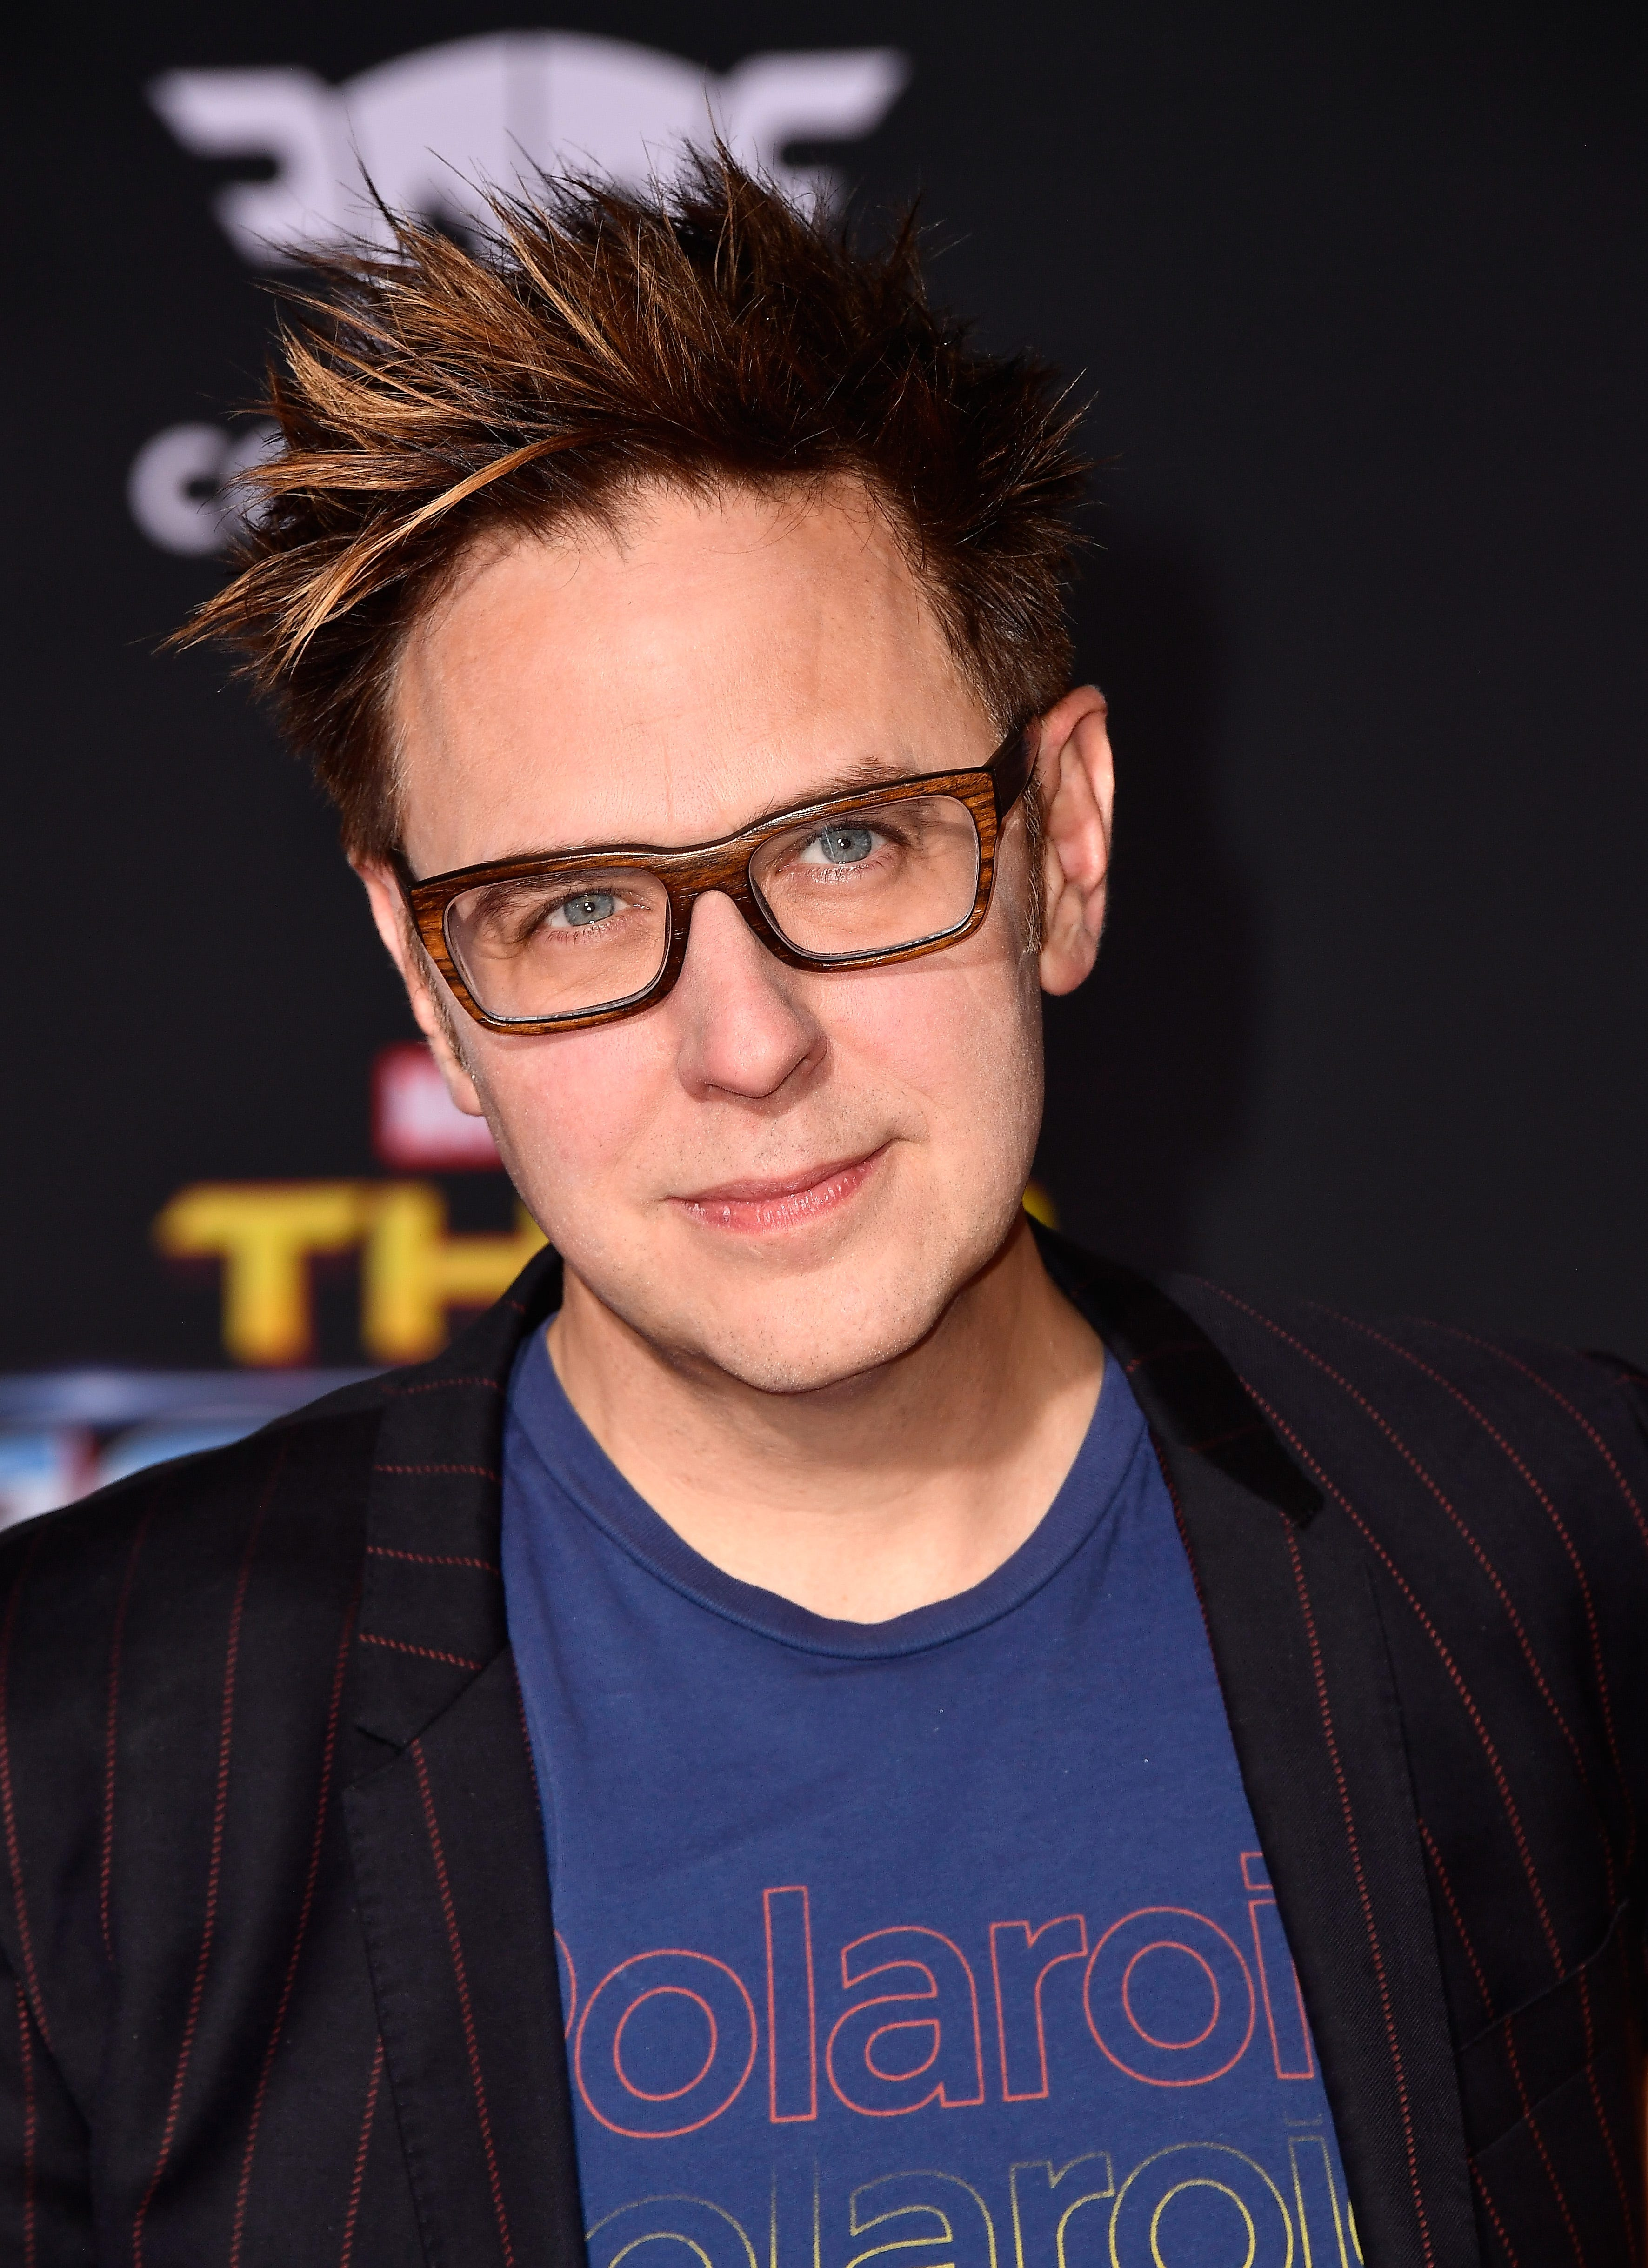 James Gunn rehired as 'Guardians of the Galaxy 3' director after Disney reverses firing